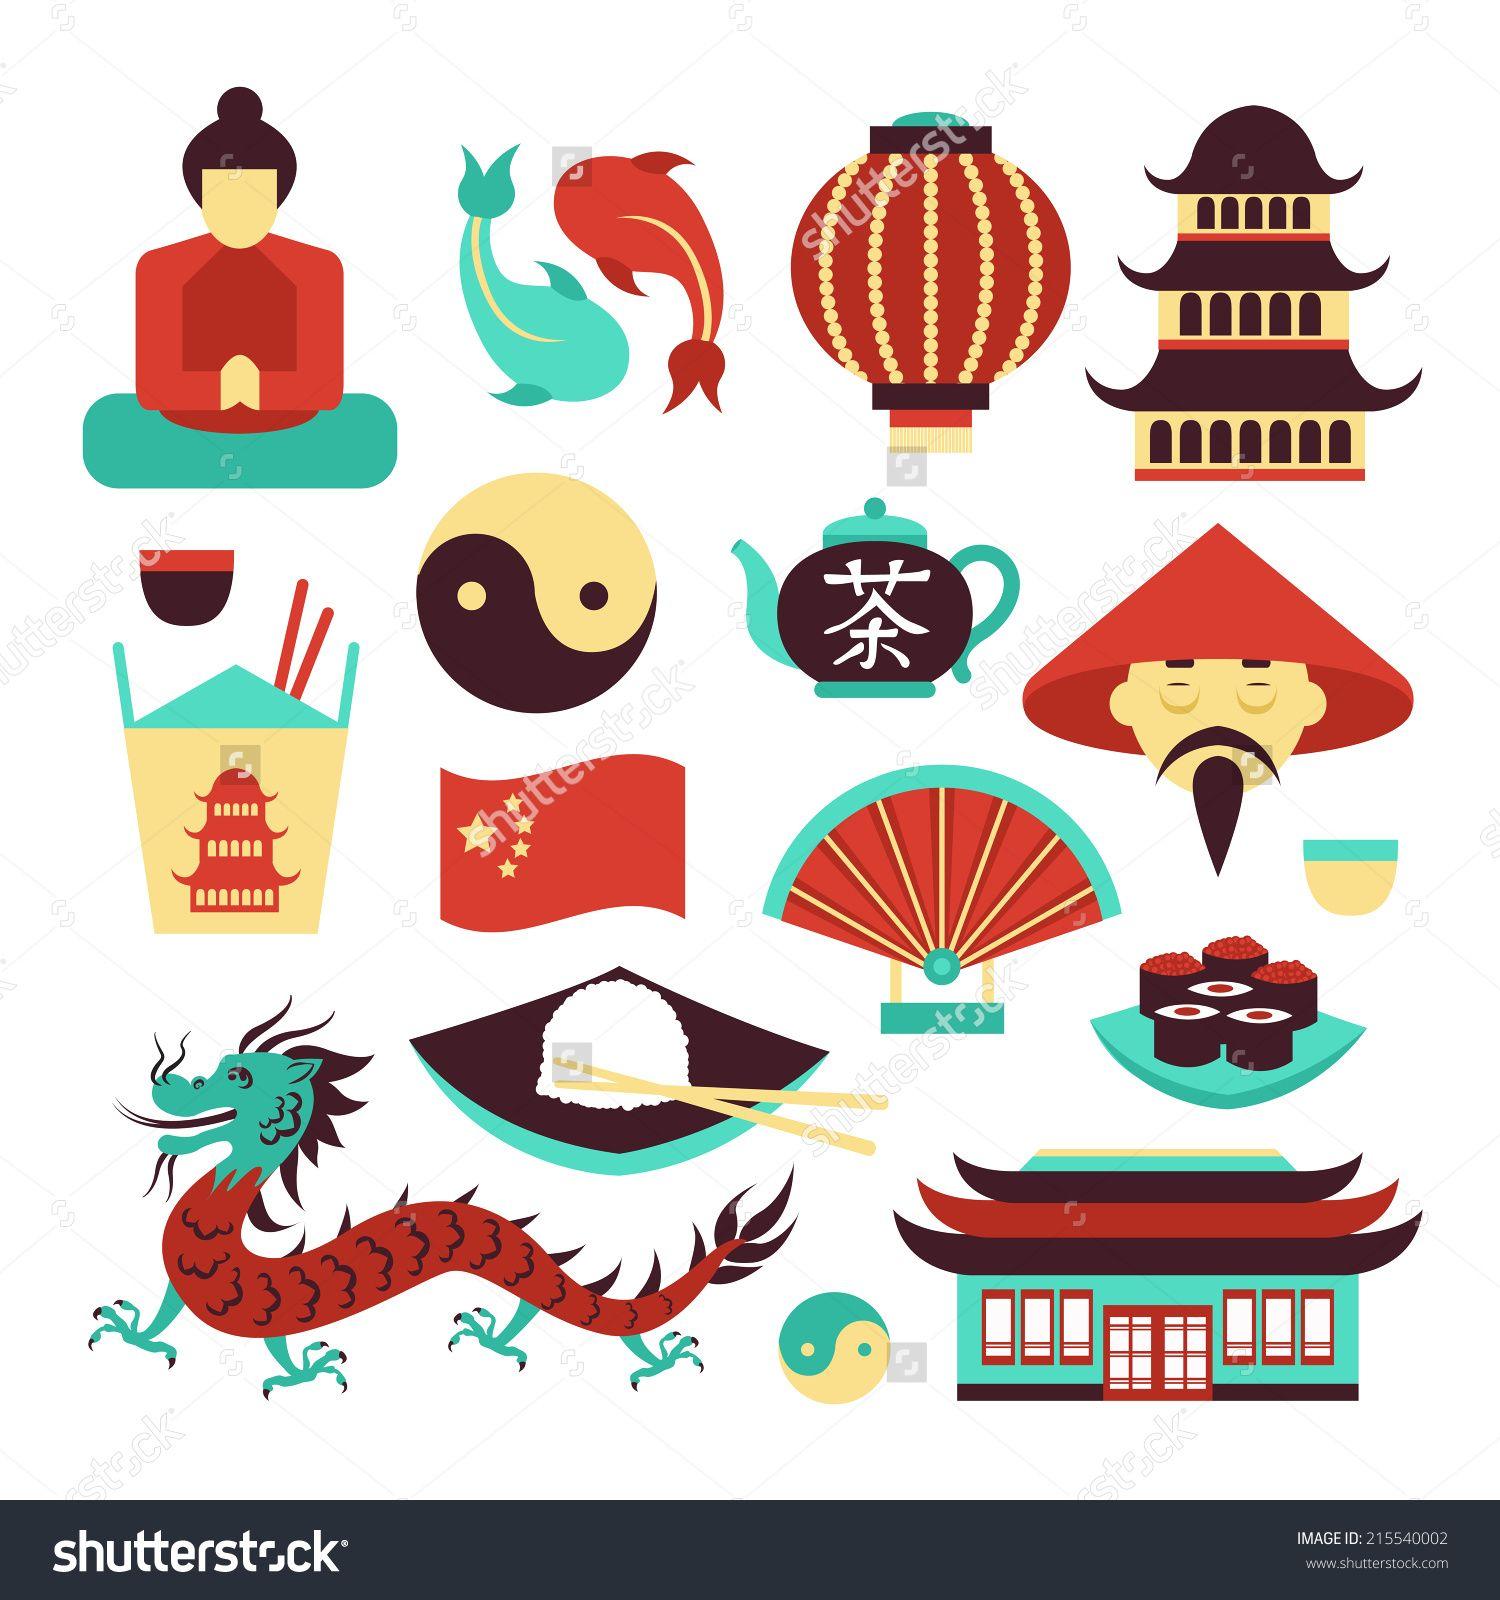 China clipart illustration. Http www statebudgettaskforce info